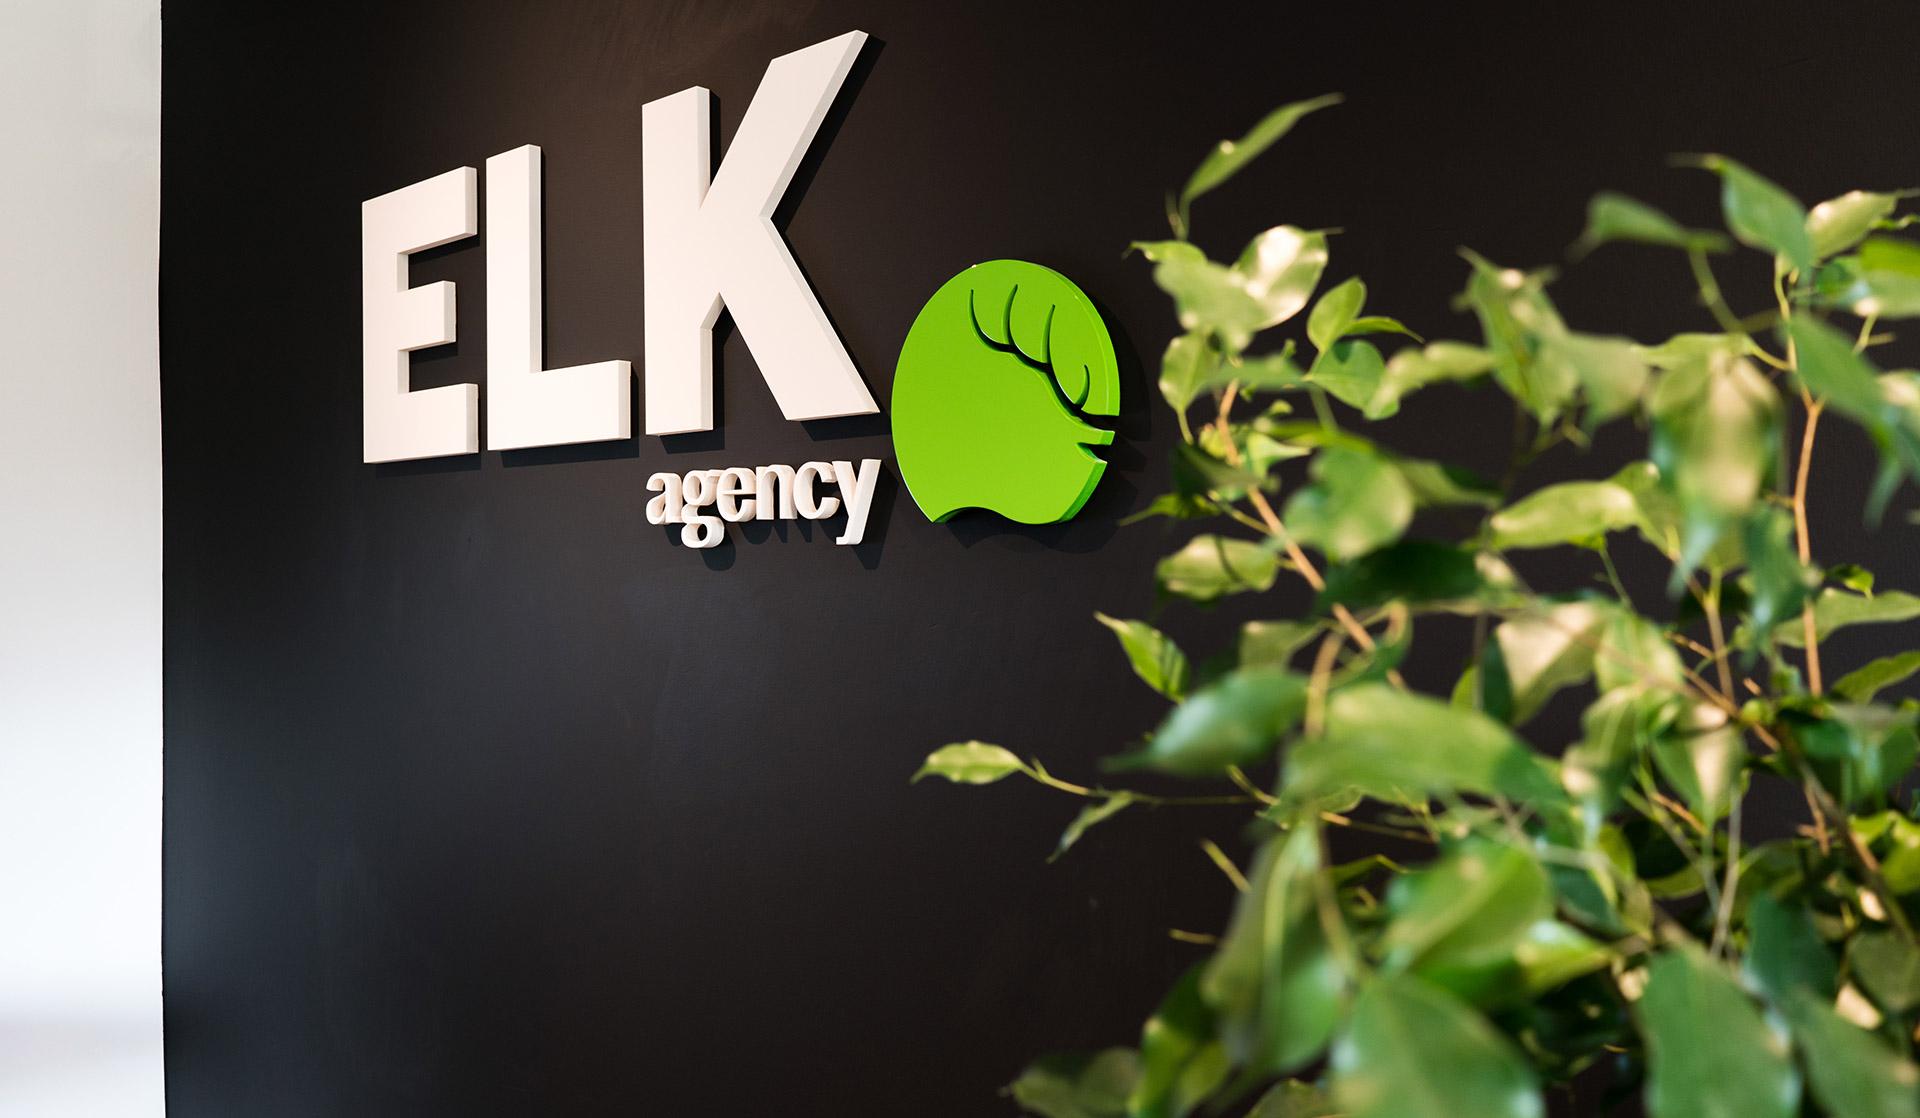 ELK agency | Communication & Design agency | Team